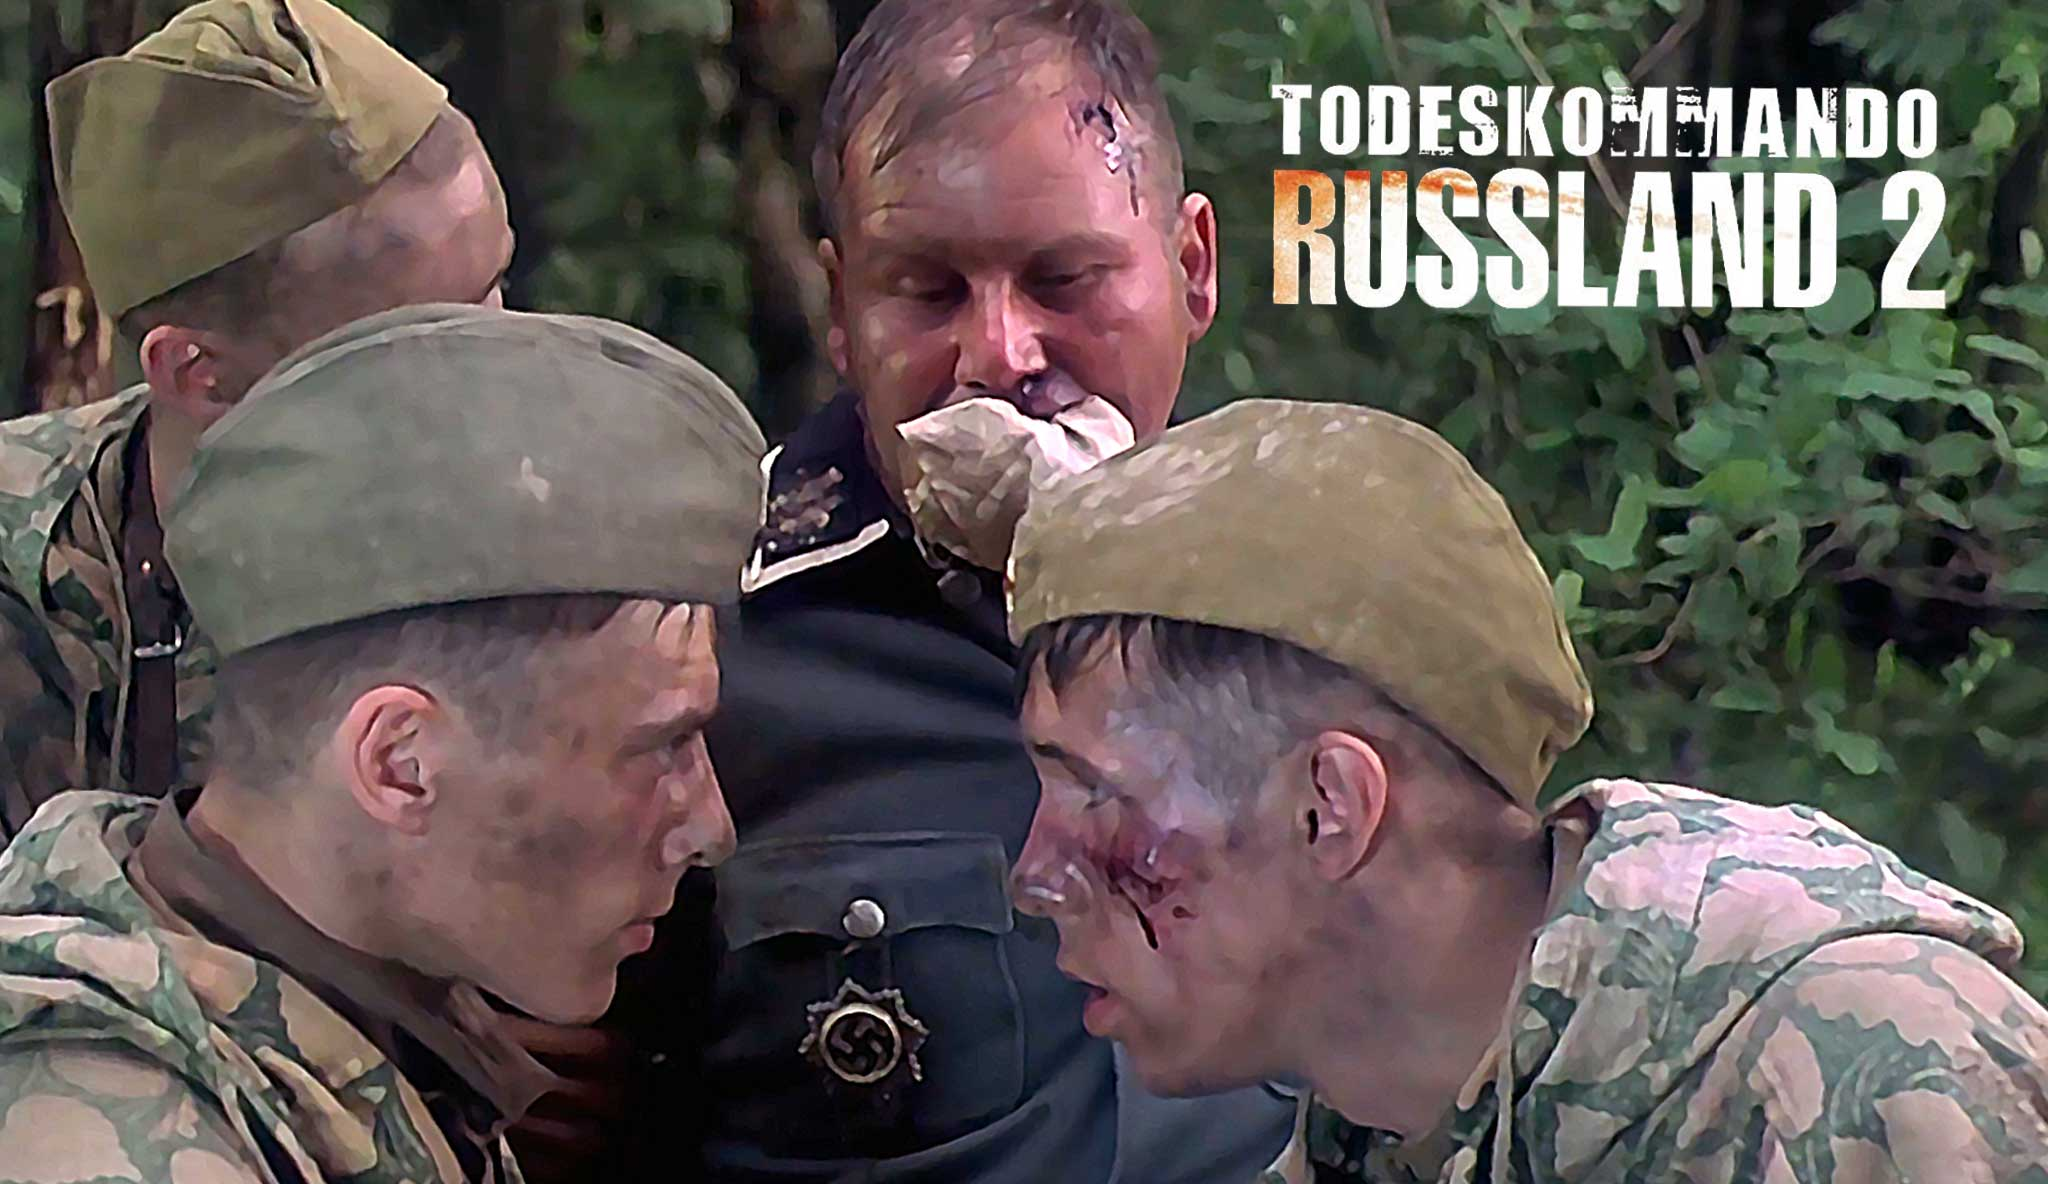 todeskommando-russland-2\header.jpg